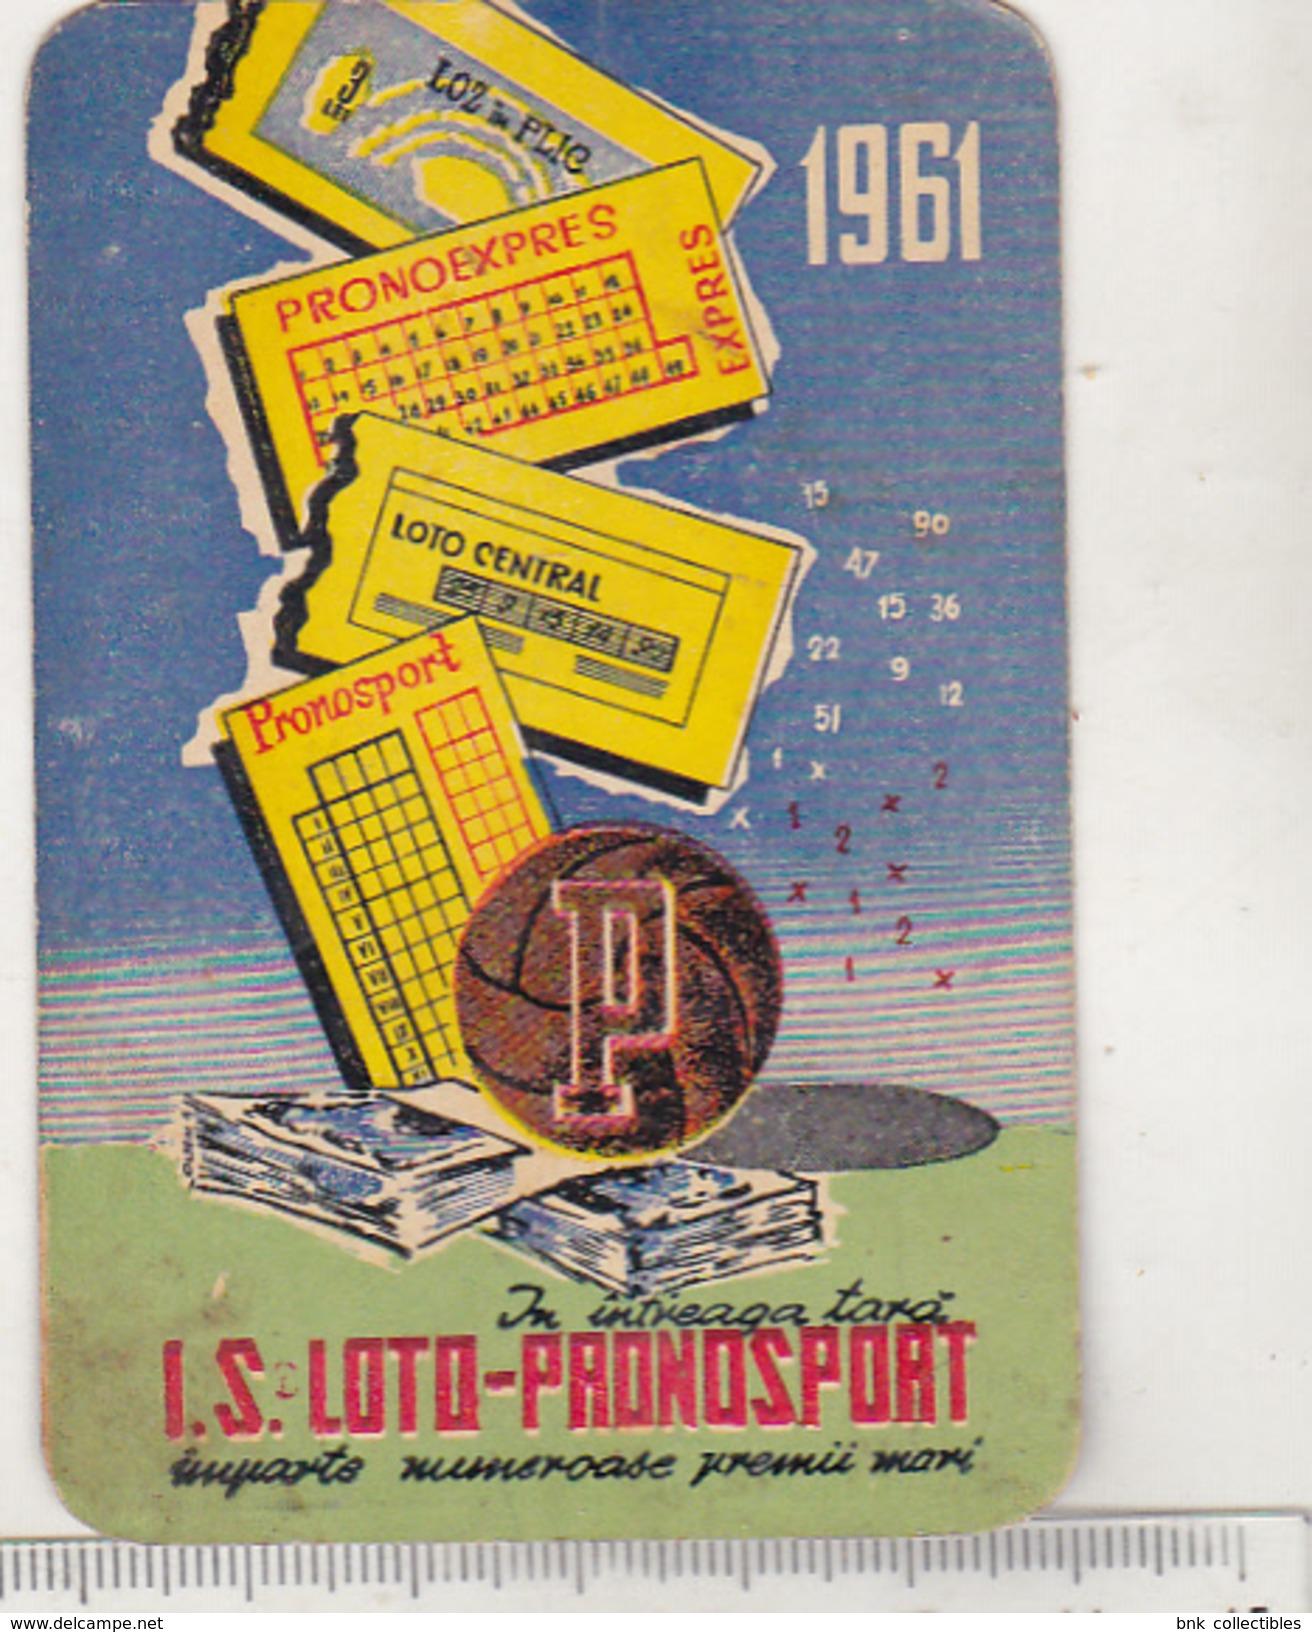 Romanian Small Calendar - 1961 - Lottery - Loto-pronosport - Petit Format : 1961-70